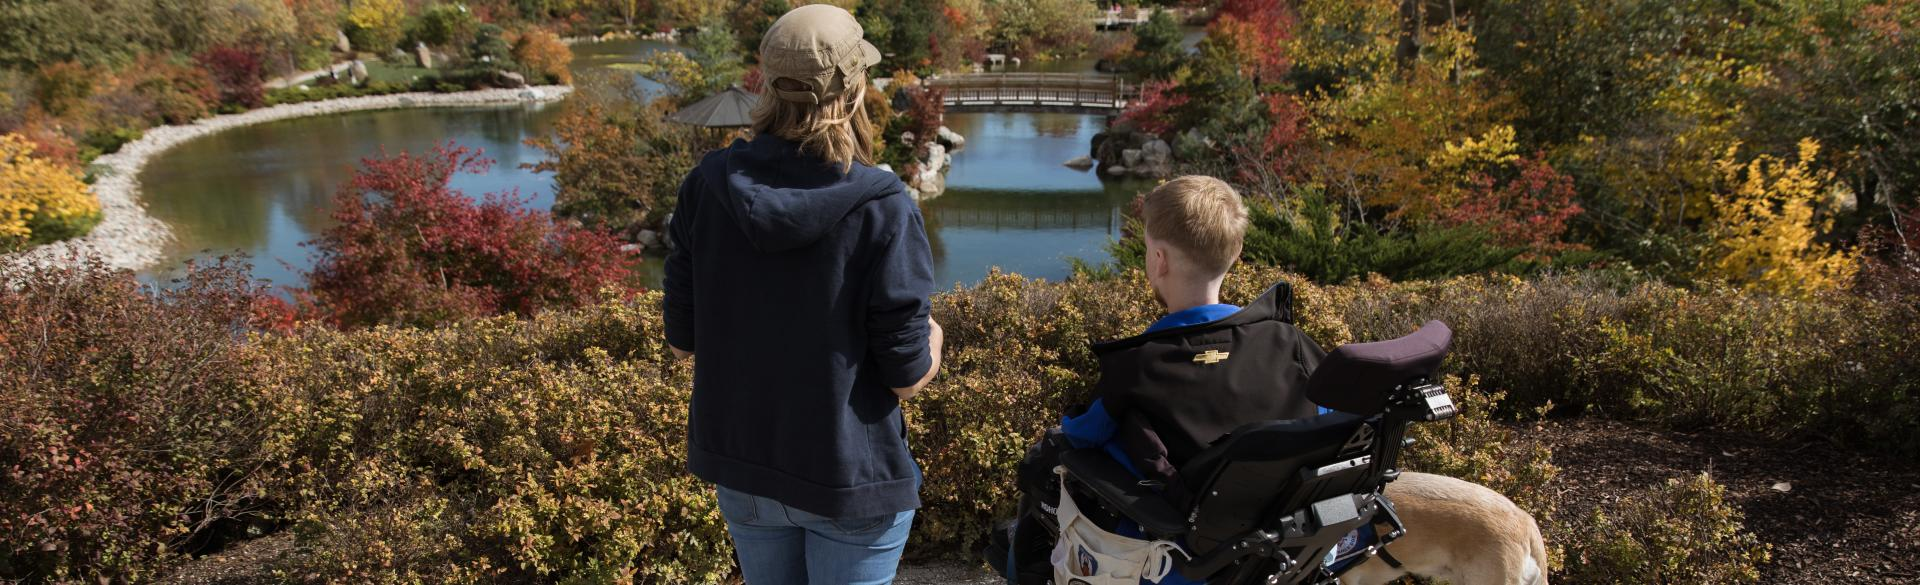 Viewing the The Richard & Helen DeVos Japanese Garden.